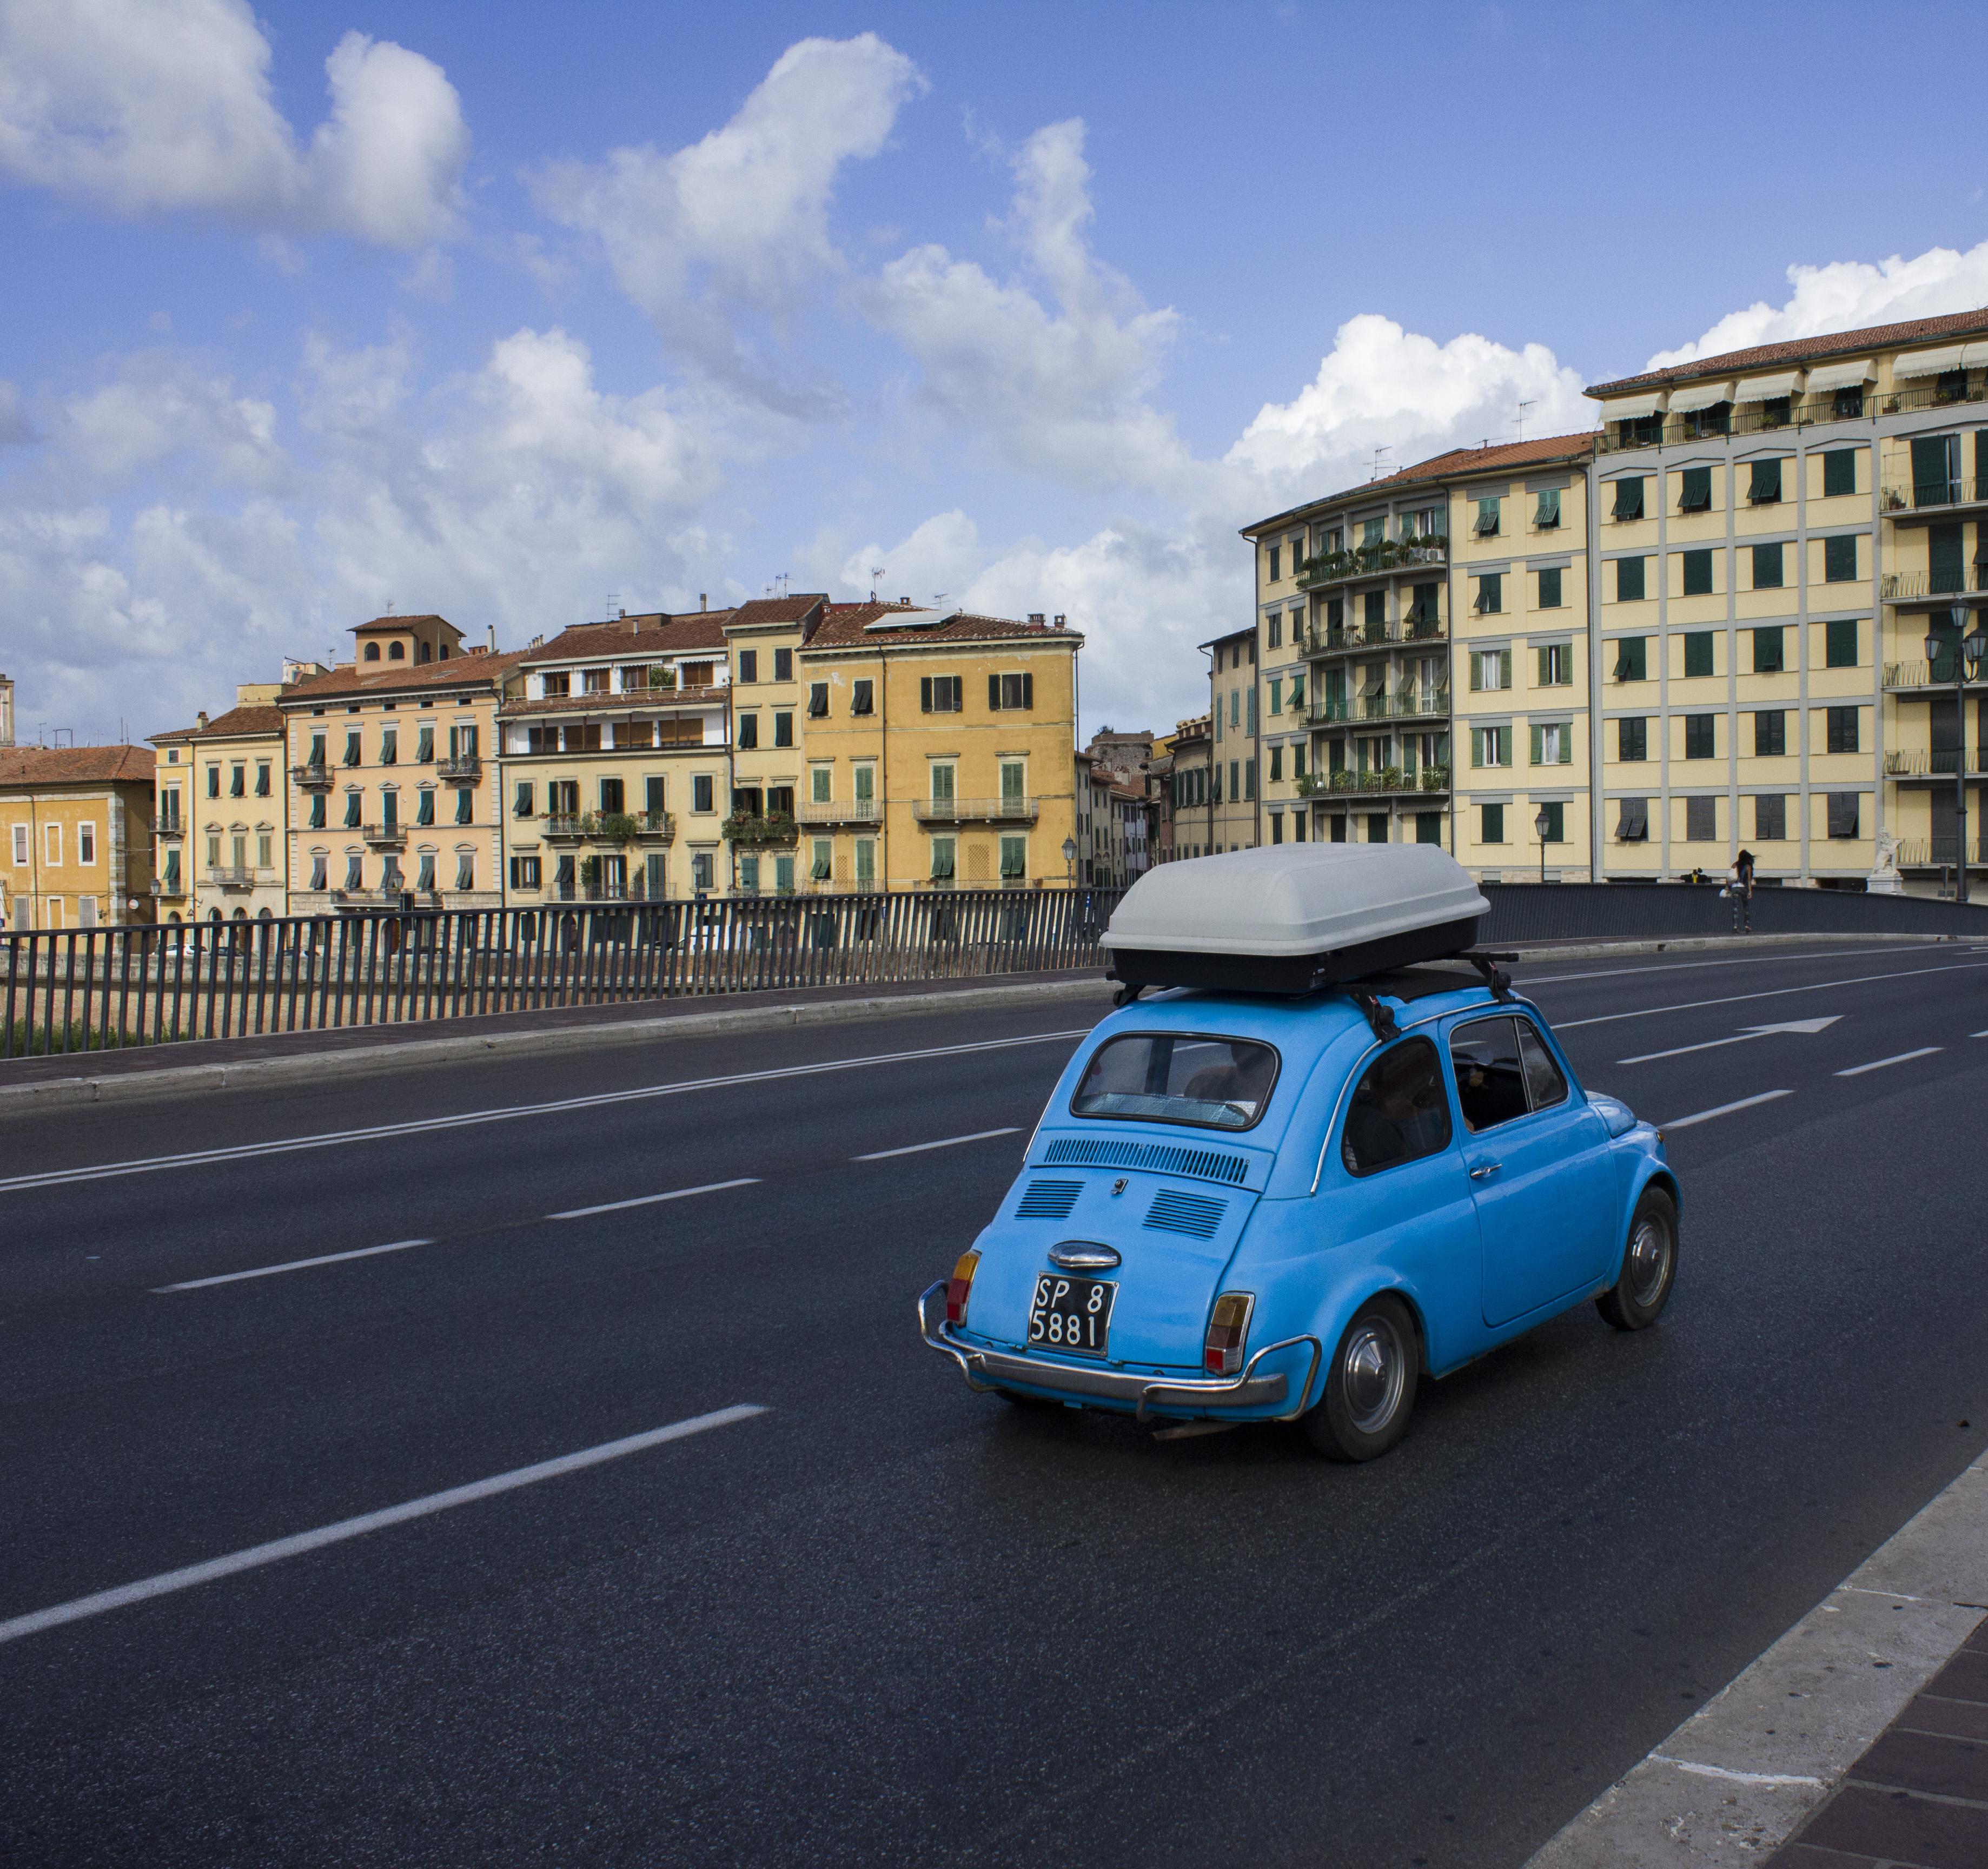 Blue Fiat on the street